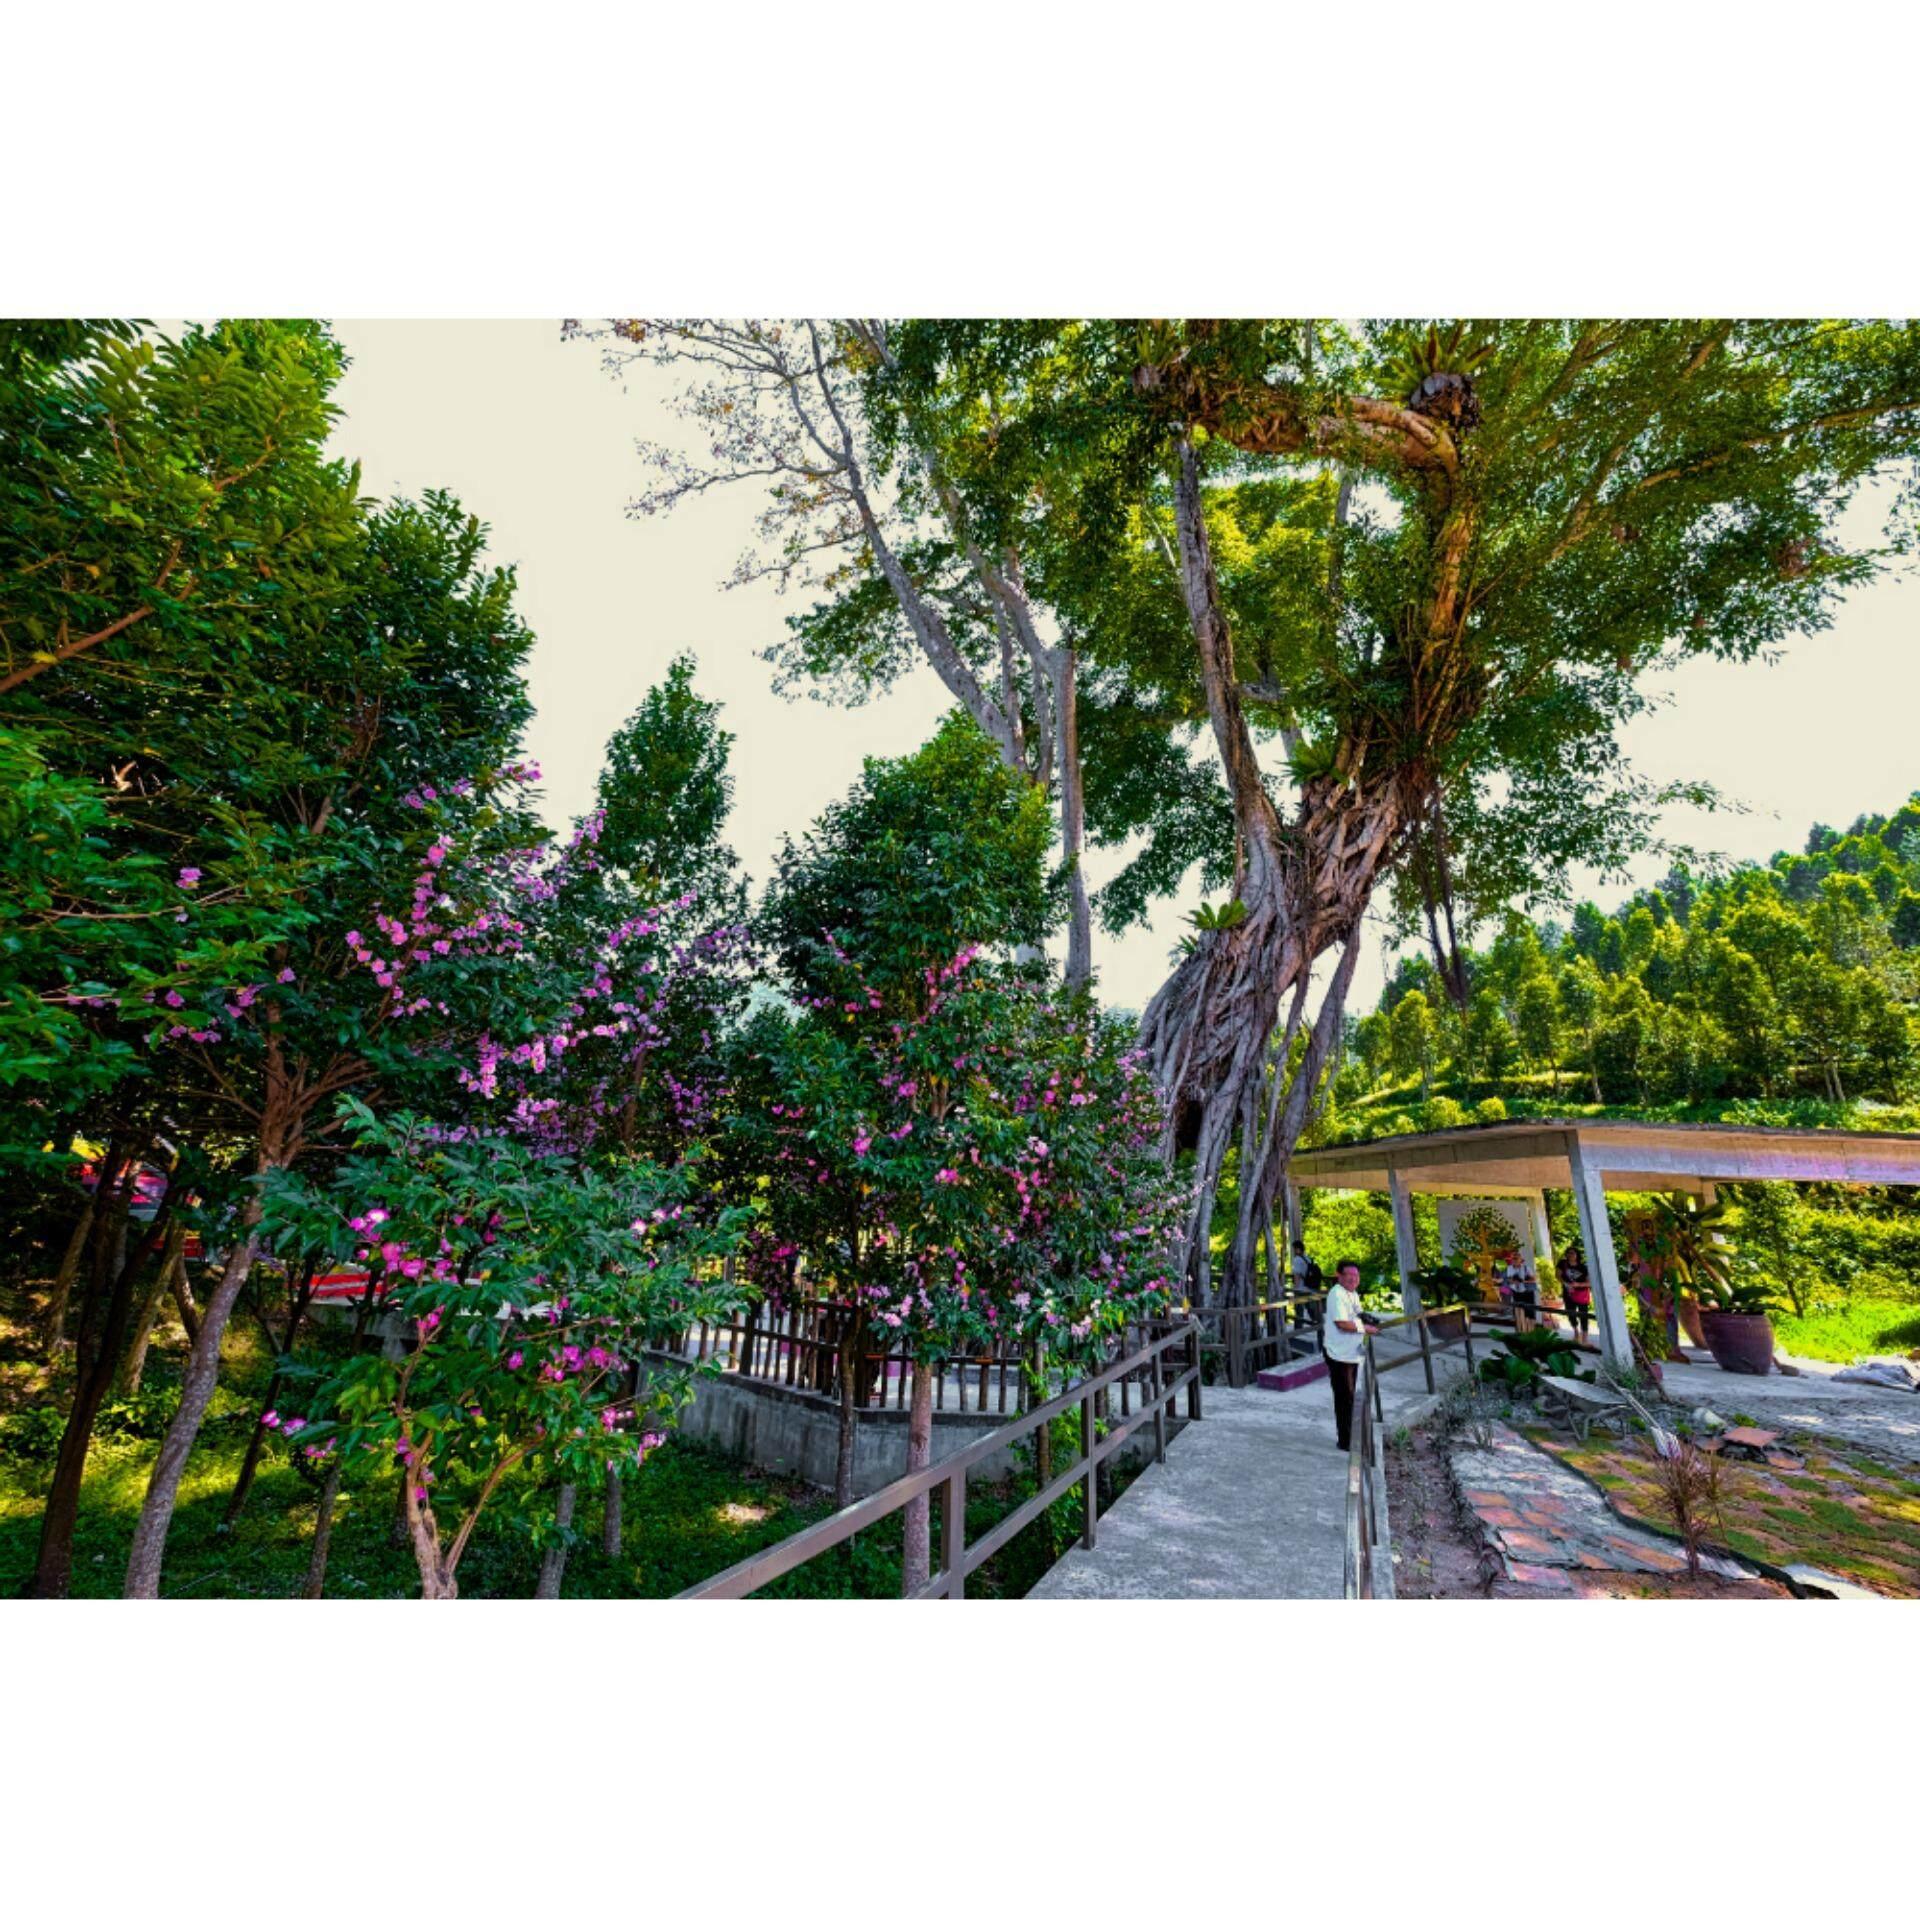 Perak : HOGA Gaharu Tea Valley Experience (FREE HOGA Tea 10 teabags + HOGA Tea Set) - Child